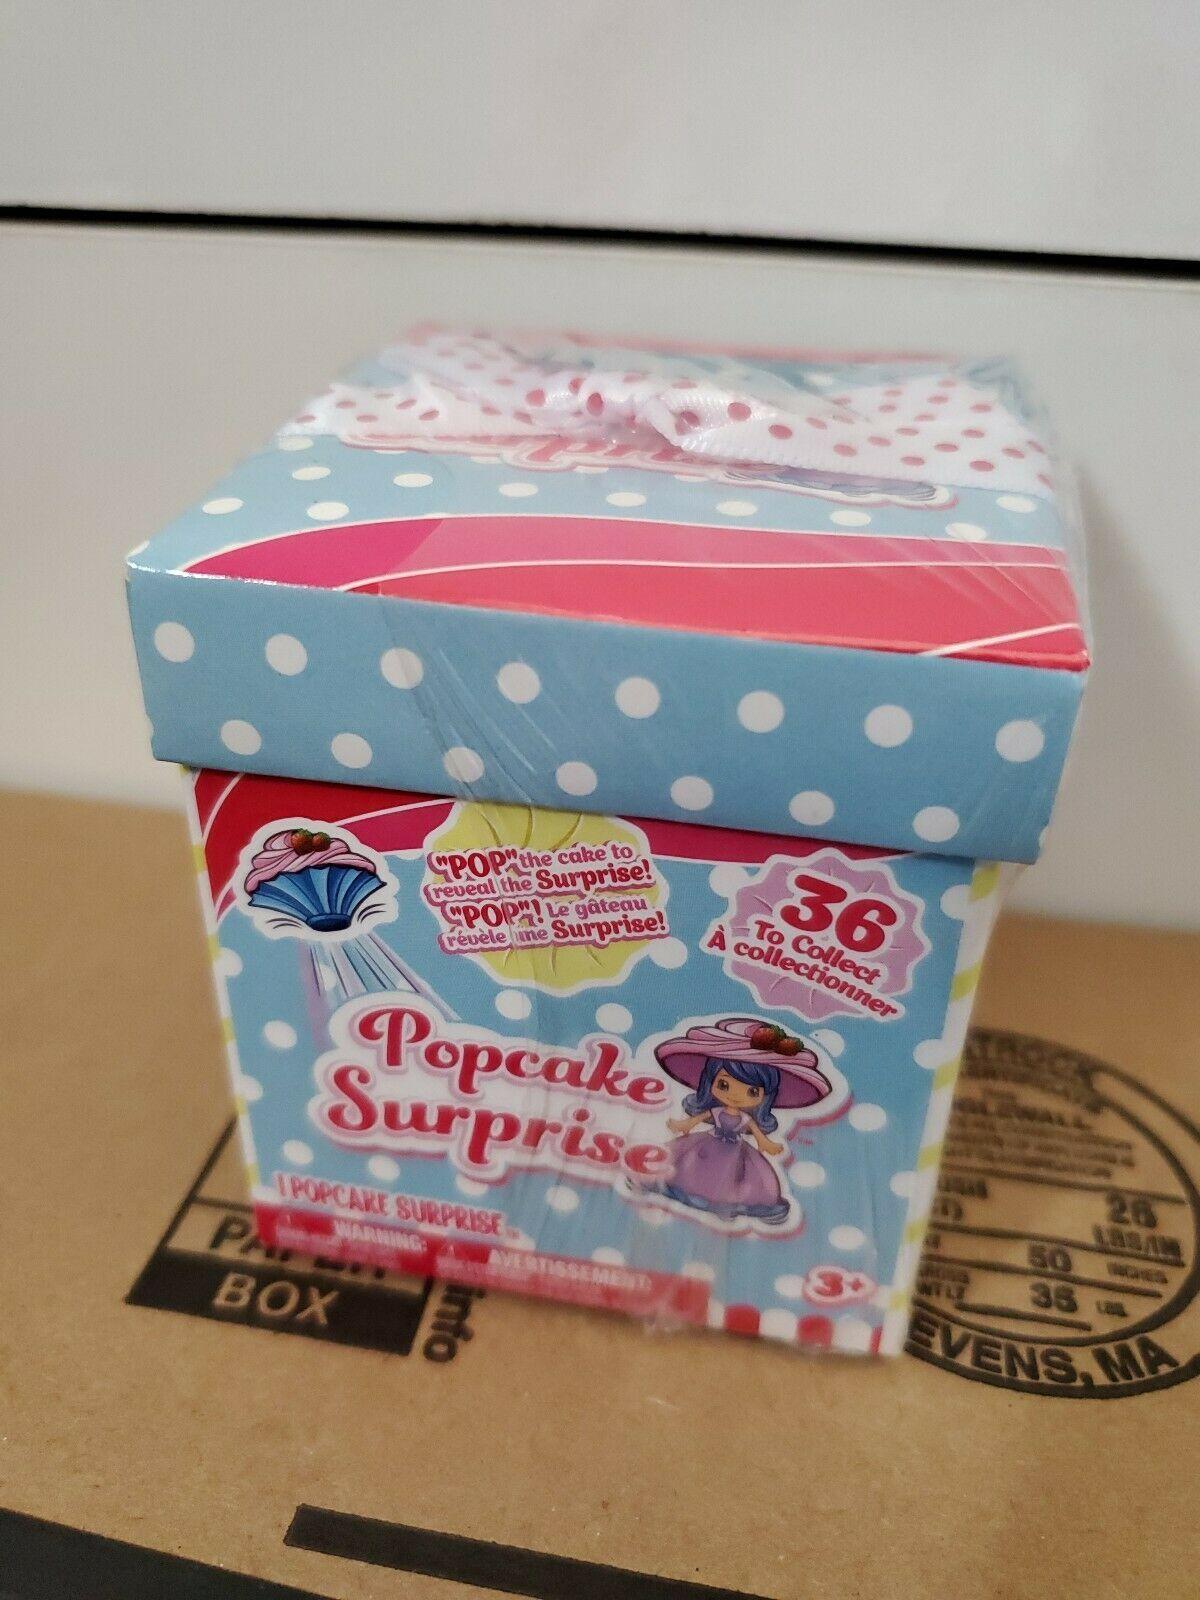 Popcake Surprise Blind Box 1 Popcake Surprise Haschel Toys Brand New Sealed Surprise Box Ideas Of Surprise Surprise Box Mystery Box Ideas Boxes For Sale